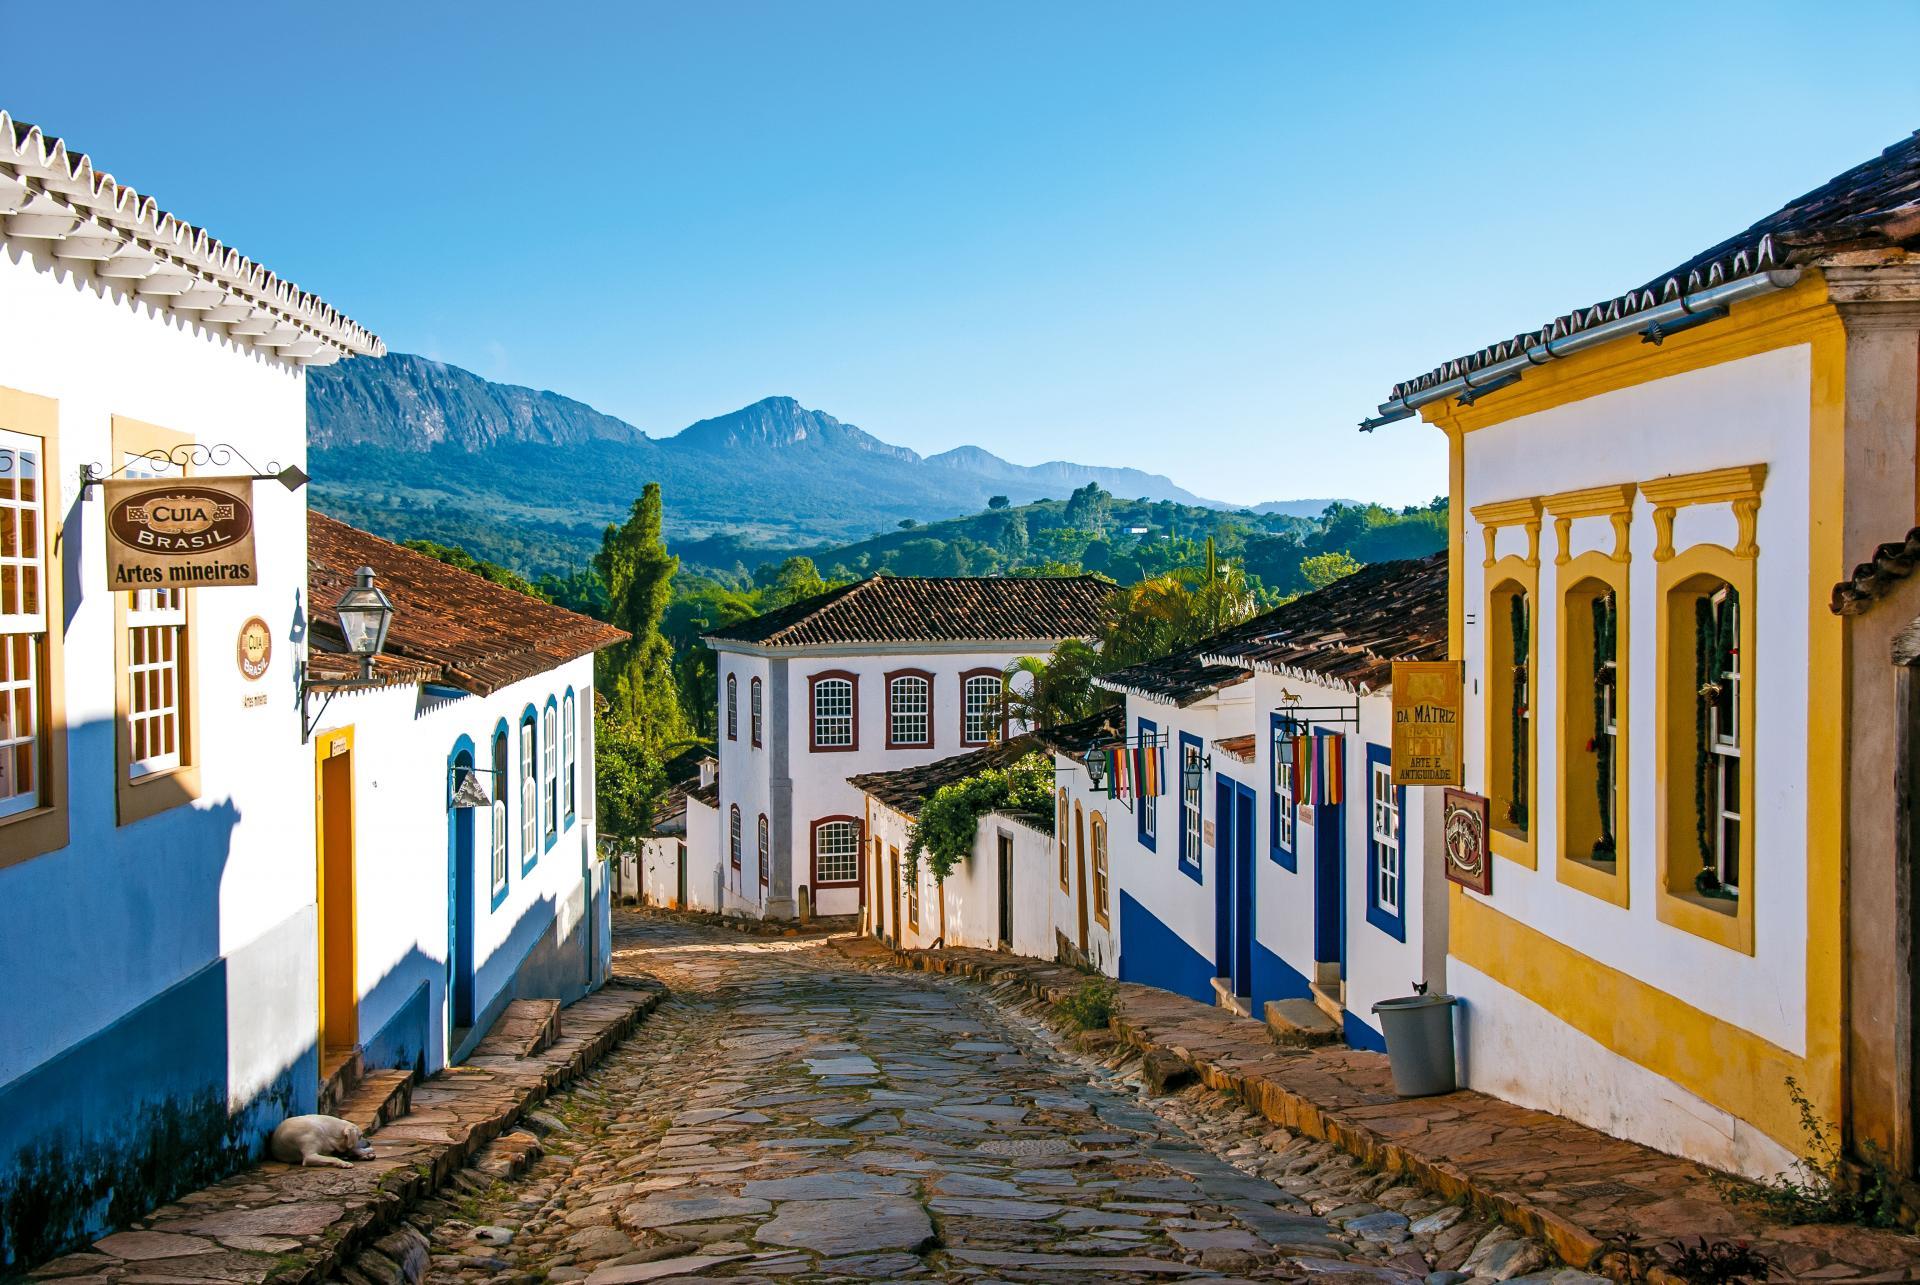 Brasilien | Rio de Janeiro, Sao Joao del Rei, Tiradentes, Ouro Preto, Belo Horizonte: 5 Tage Reisebaustein - Mietwagenreise von Rio de Janeiro bis Belo Horizonte